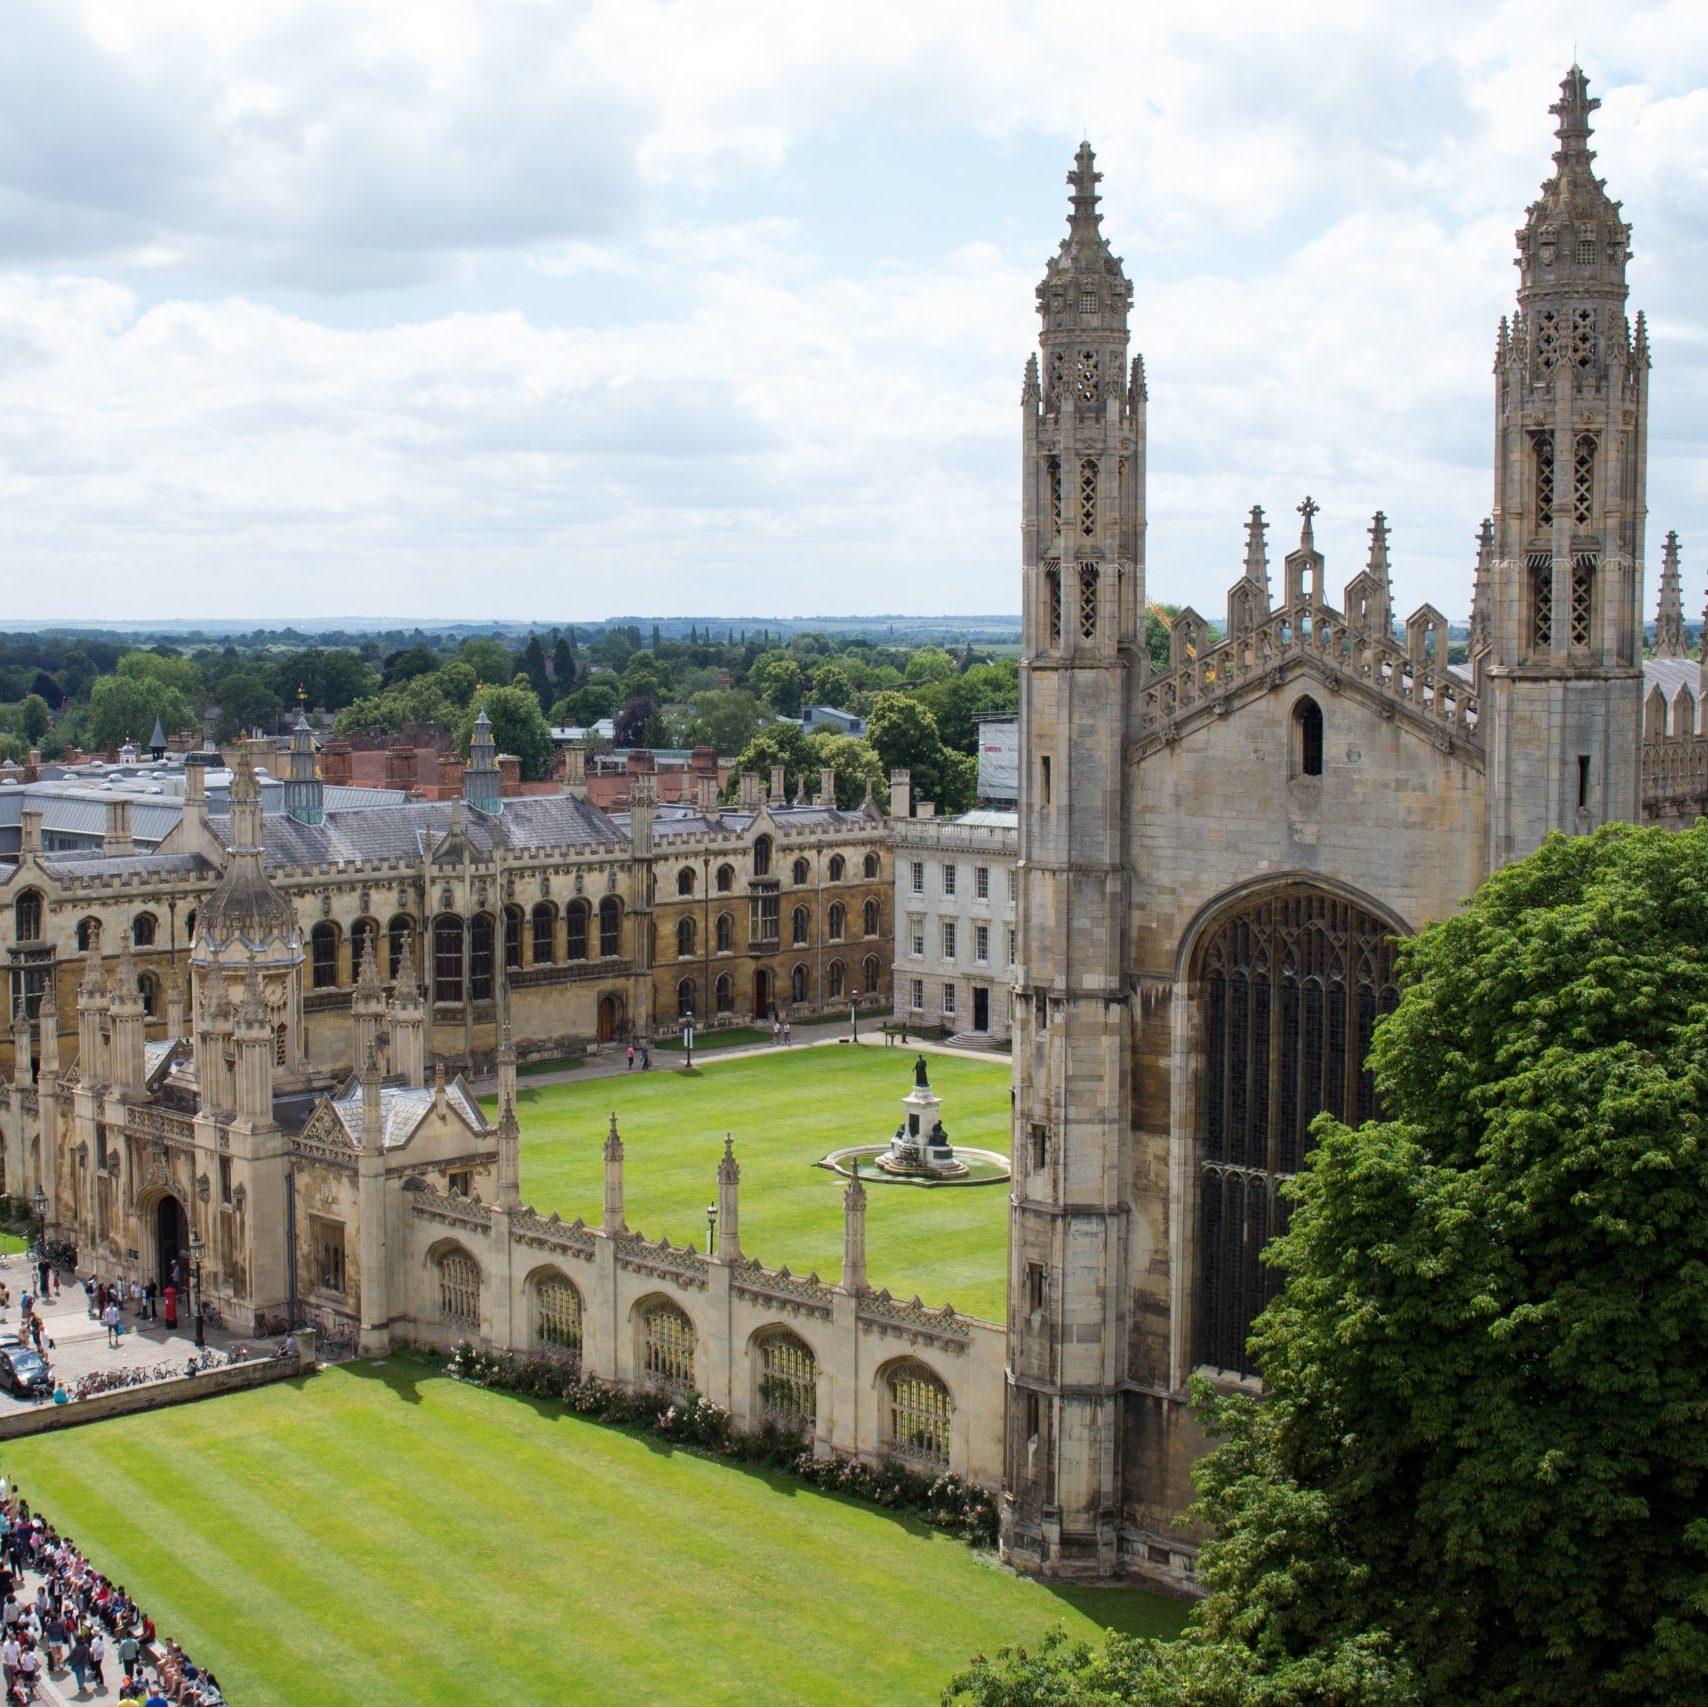 Rediscover Cambridge this summer